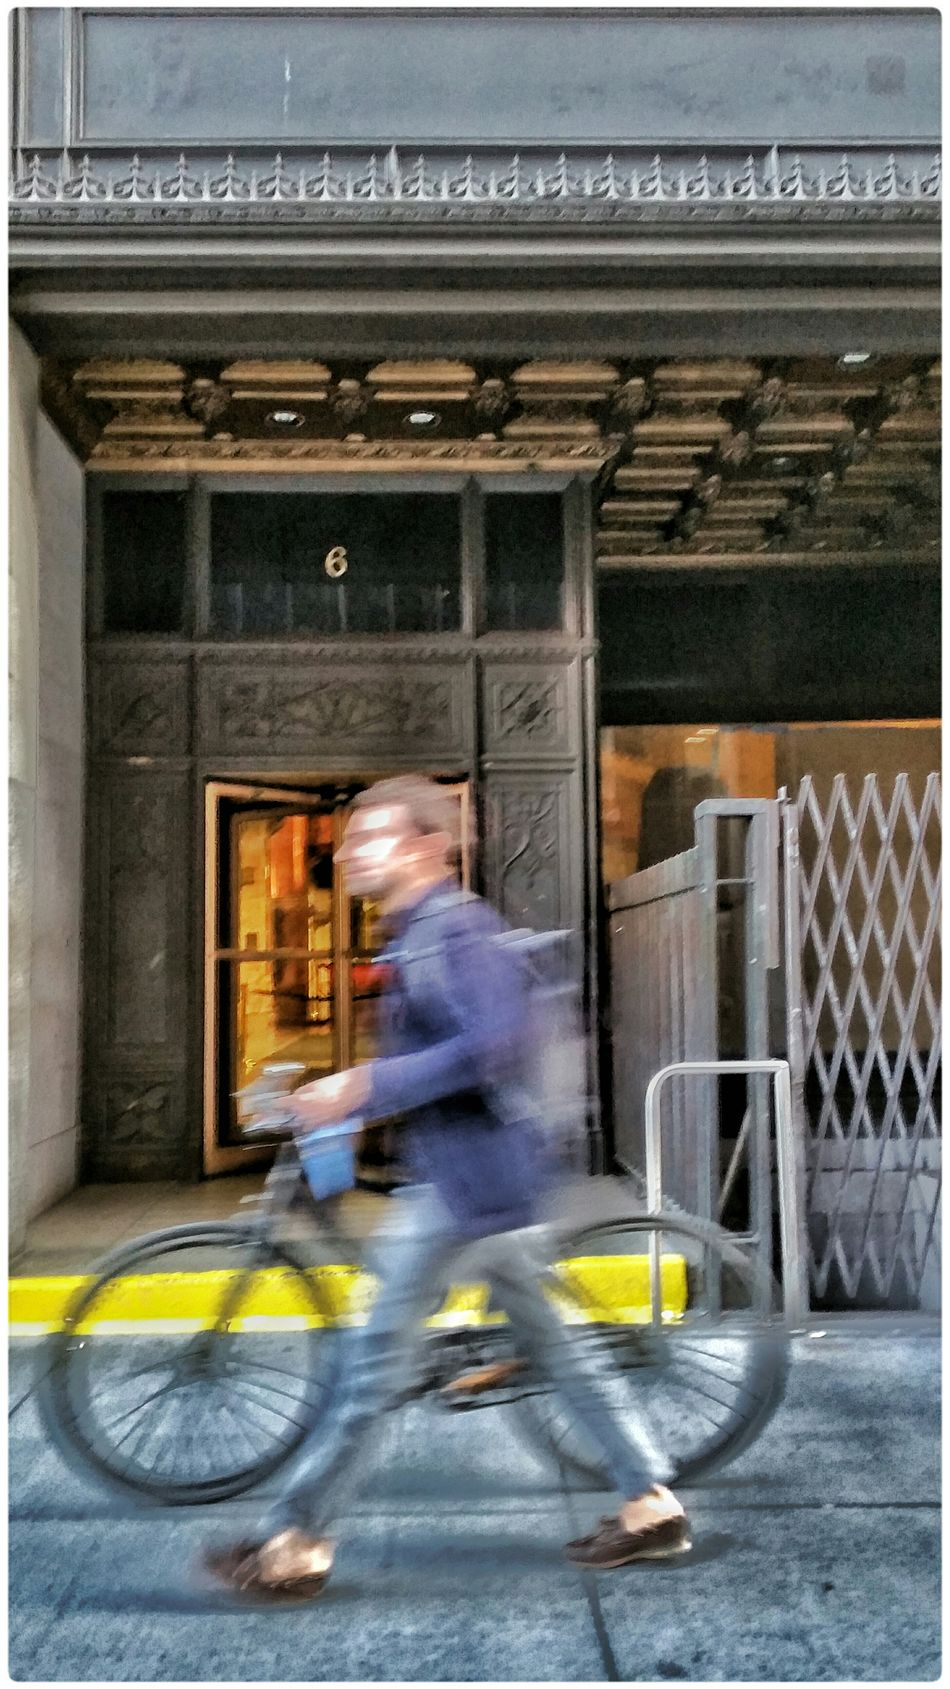 Bike Blur Motion Blur Motion Life In Motion Street Photography